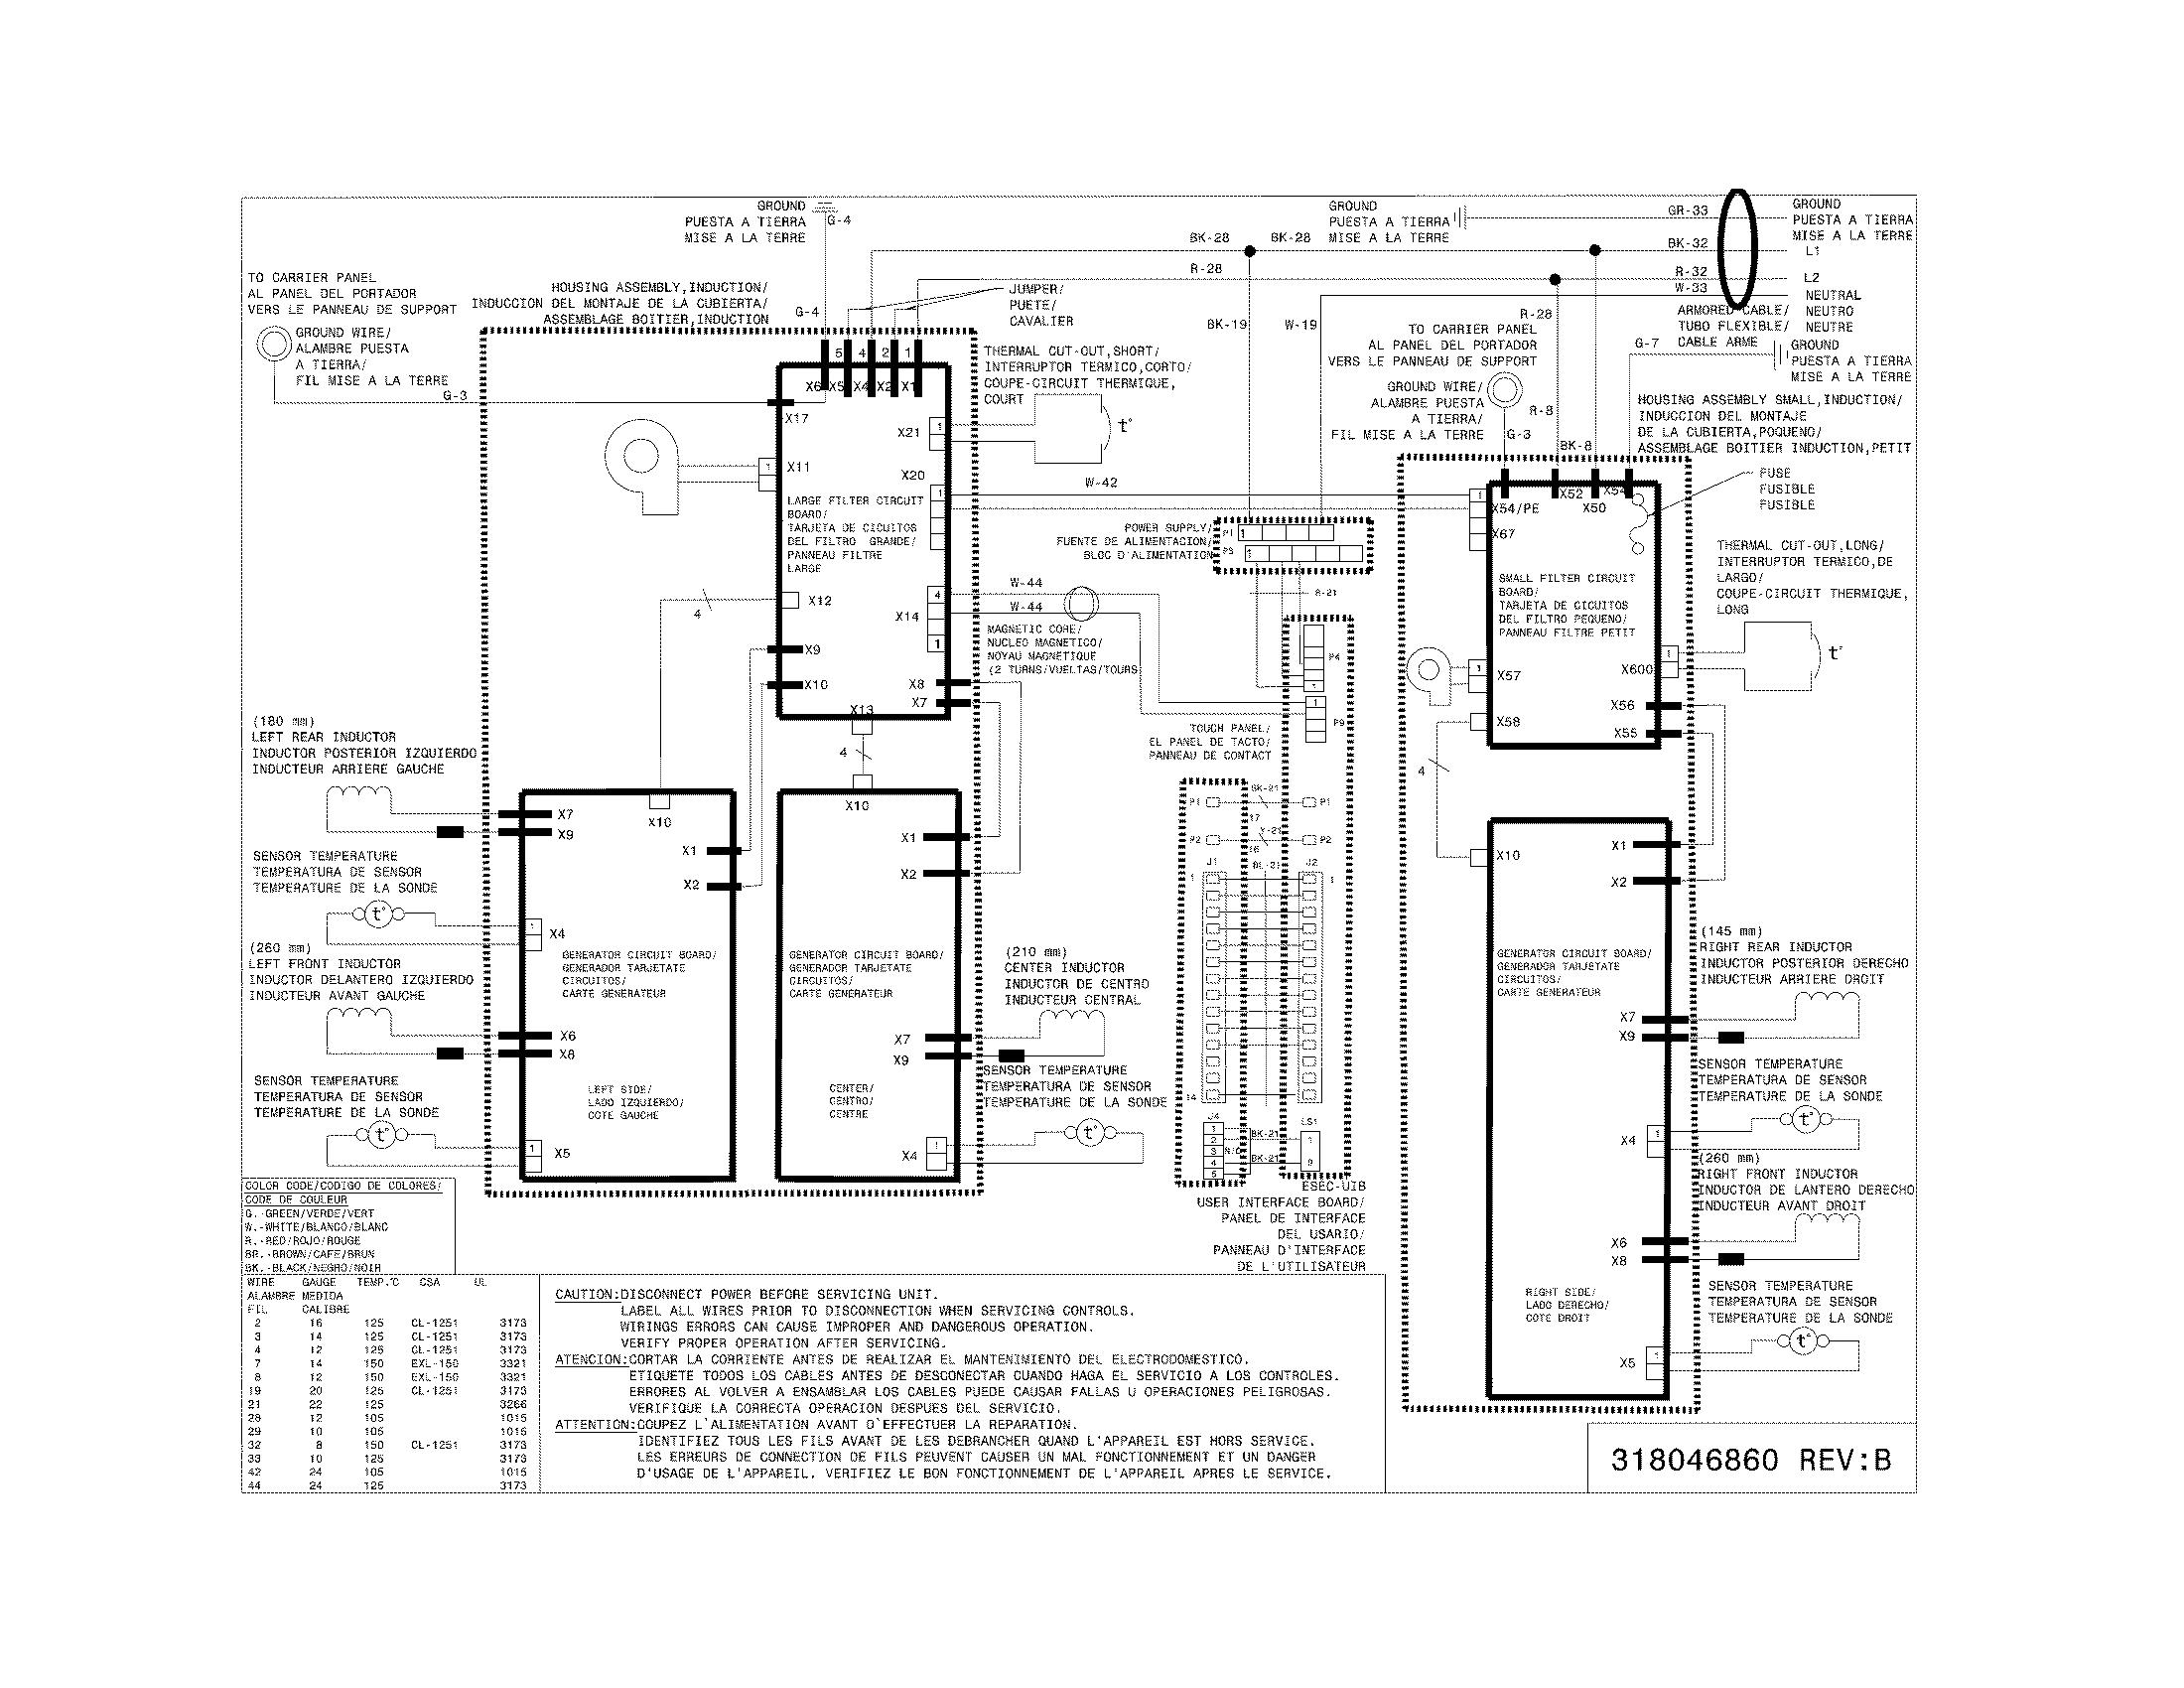 [DIAGRAM] Whirlpool Cooktop Wiring Diagrams FULL Version